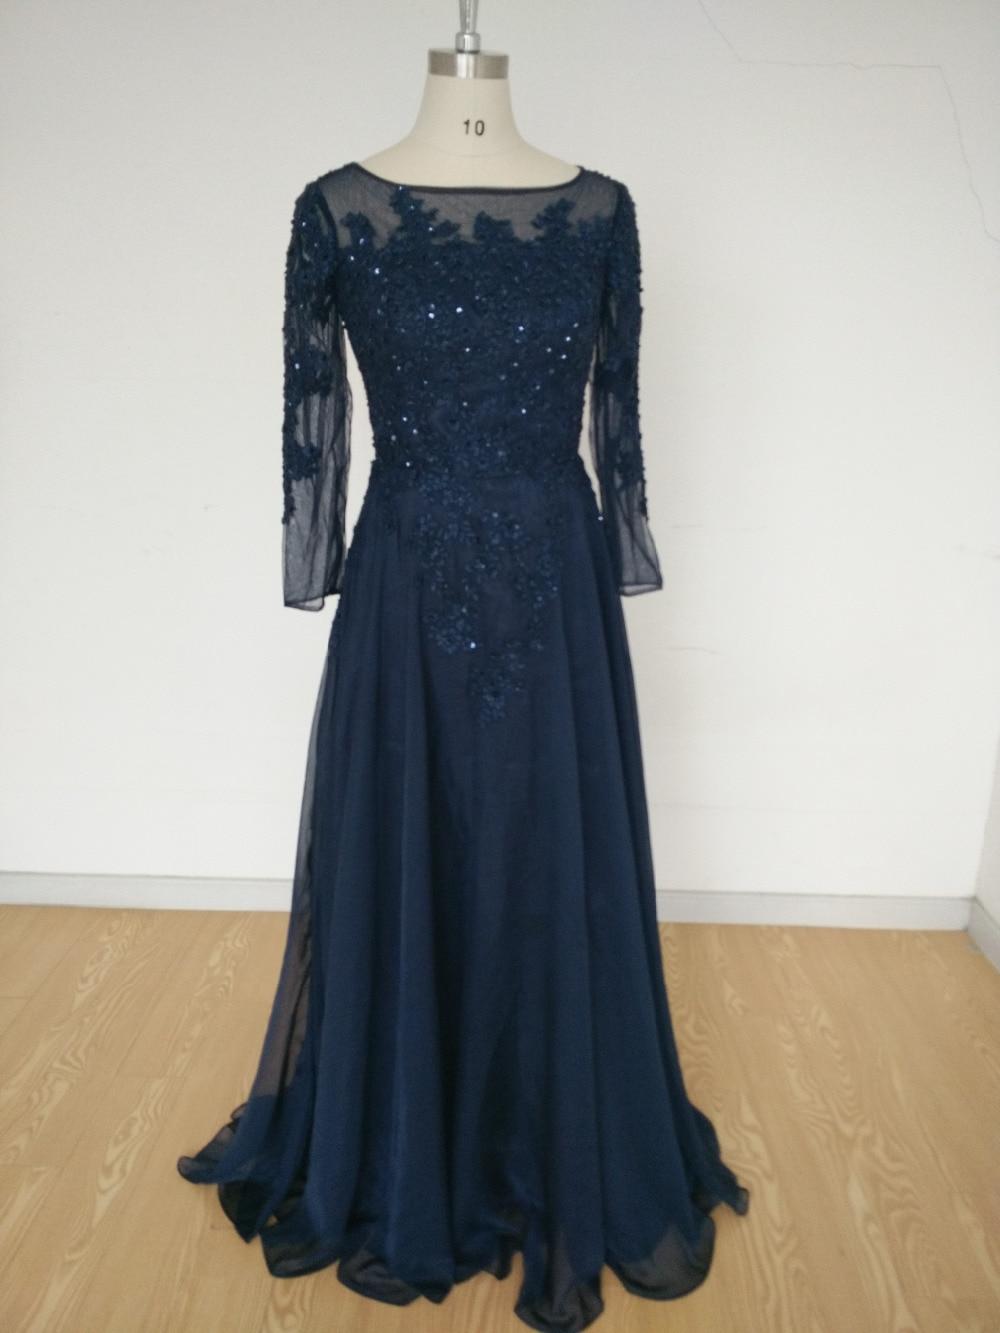 2015 Navy Blue Evening Dress Lace Sequined Applique